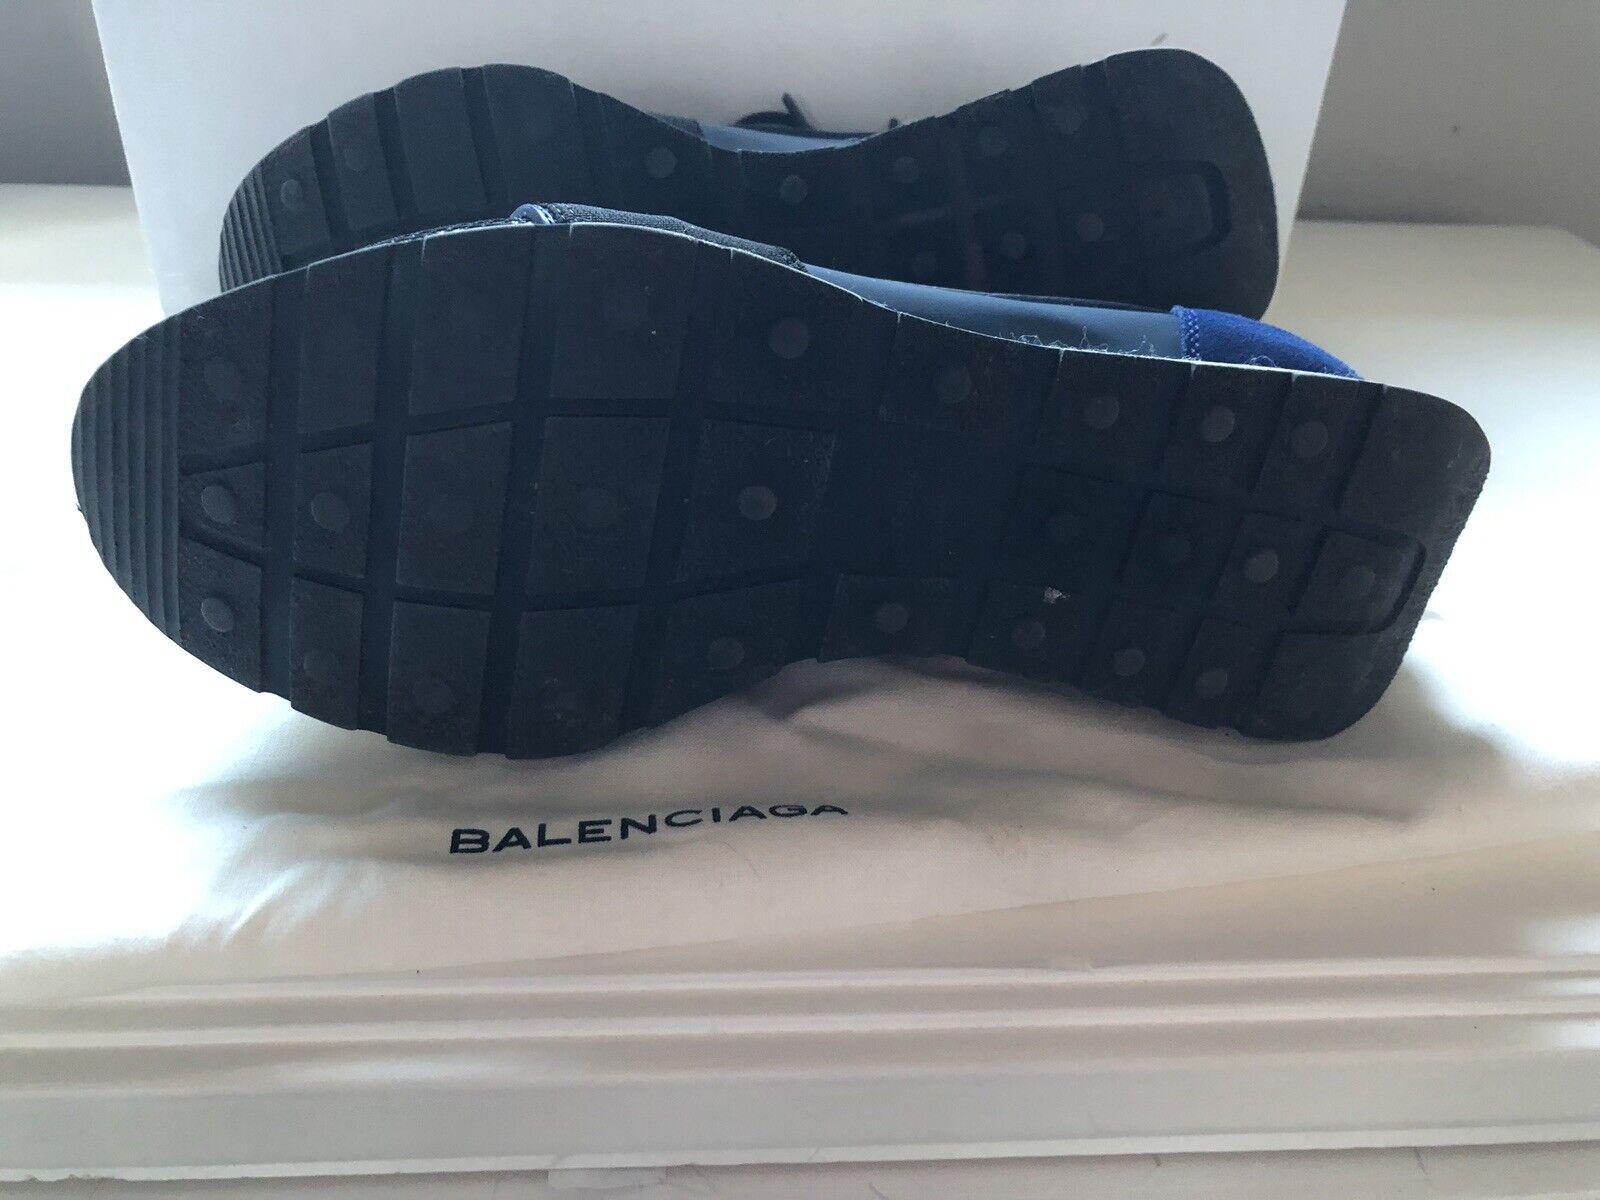 BALENCIAGA Race Runner Runner Runner Navy Blau Trainers, UK 4 US 7 EU 37 e163cd